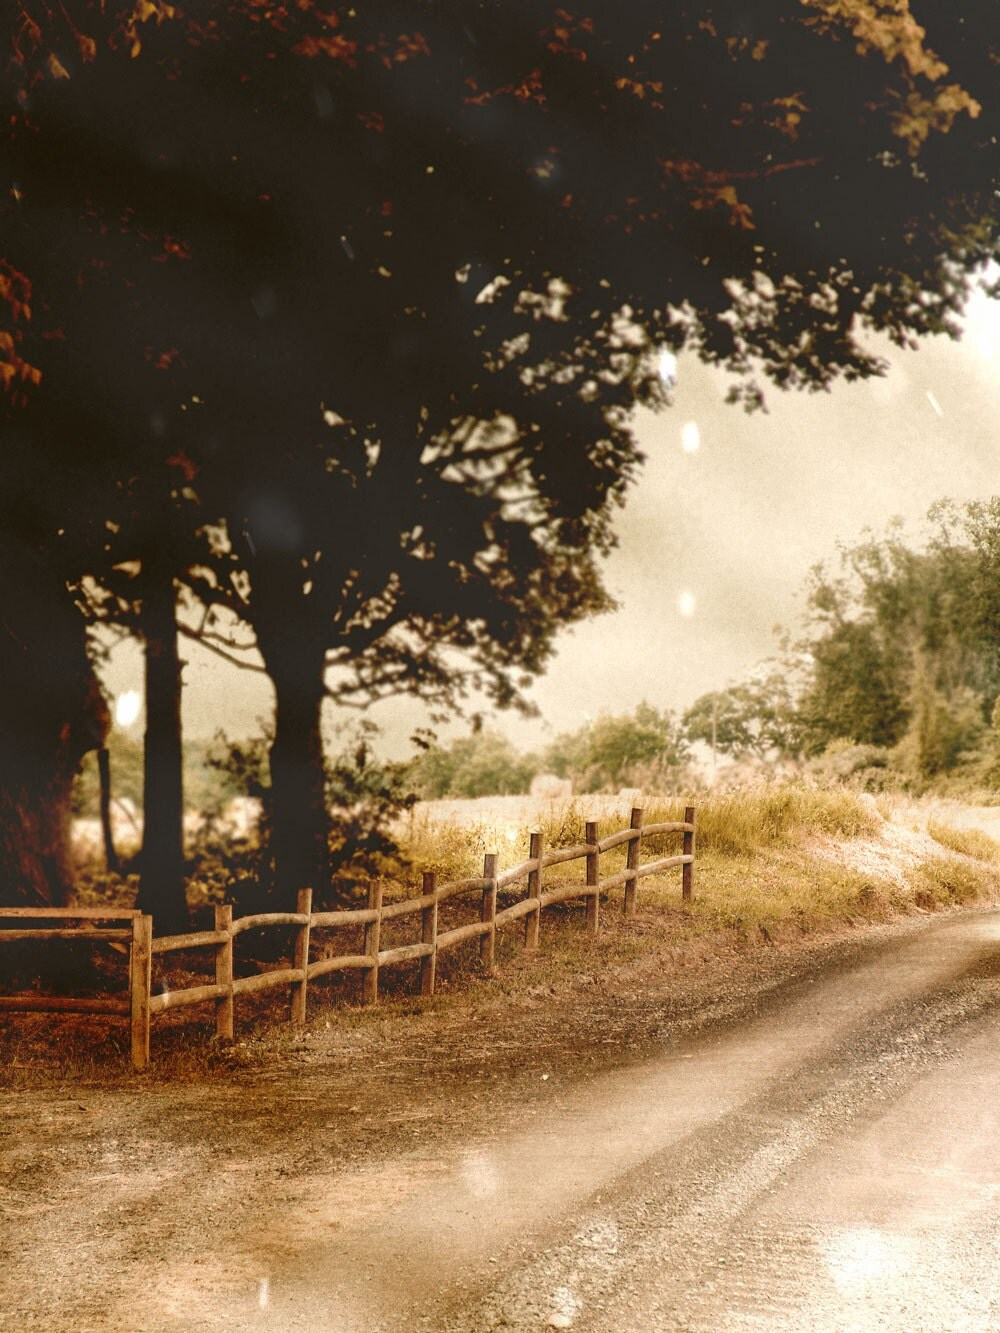 Country Lane Fine Art Photograph Fence Tree Decor Rustic Sepia